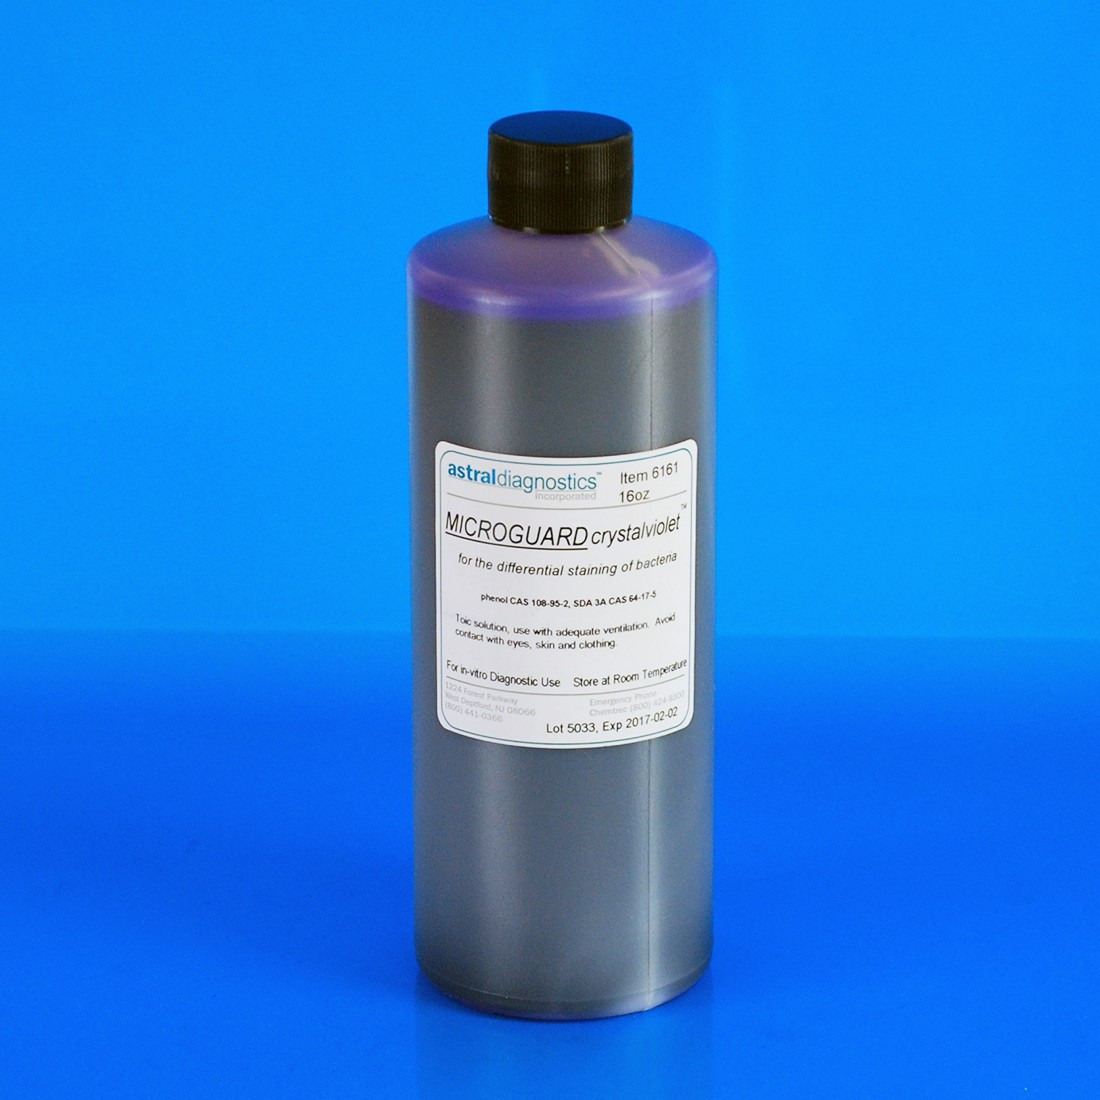 Microguard Crystal Violet